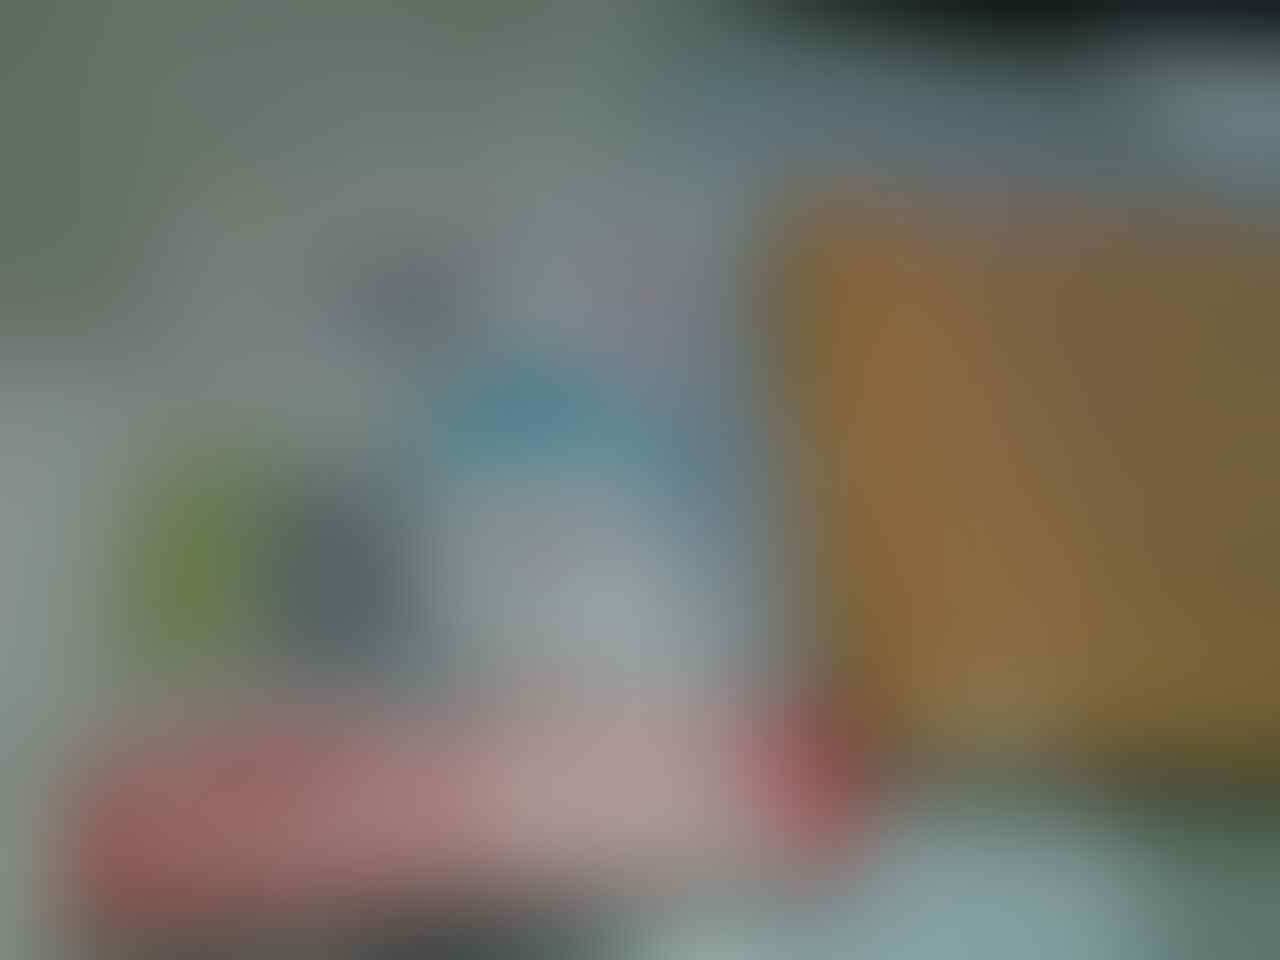 MICROSD SANDISK TOSHIBA SAMSUNG 8GB 16GB 32GB 64GB MICRO SD CLASS10 UHS1 MURAH